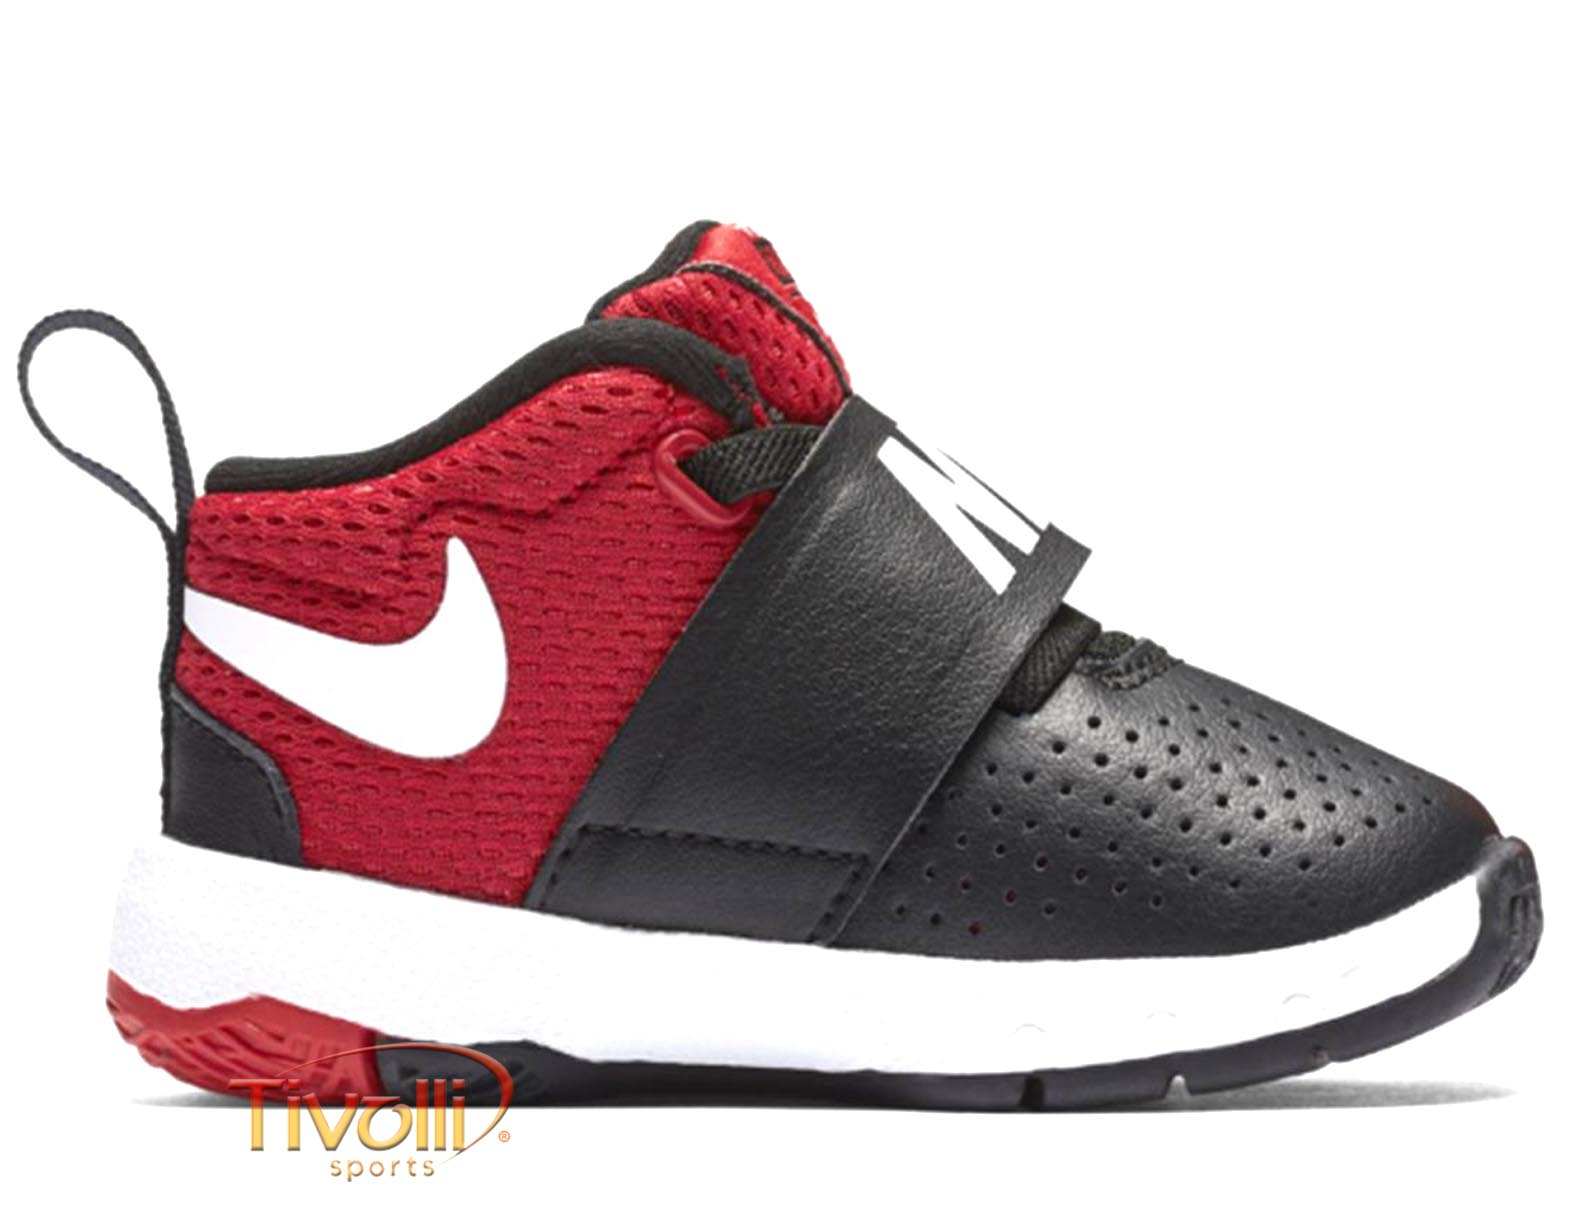 874fb416d66 Tênis Nike Team Hustle D 8 (TD) Infantil   tam. 20 ao 26